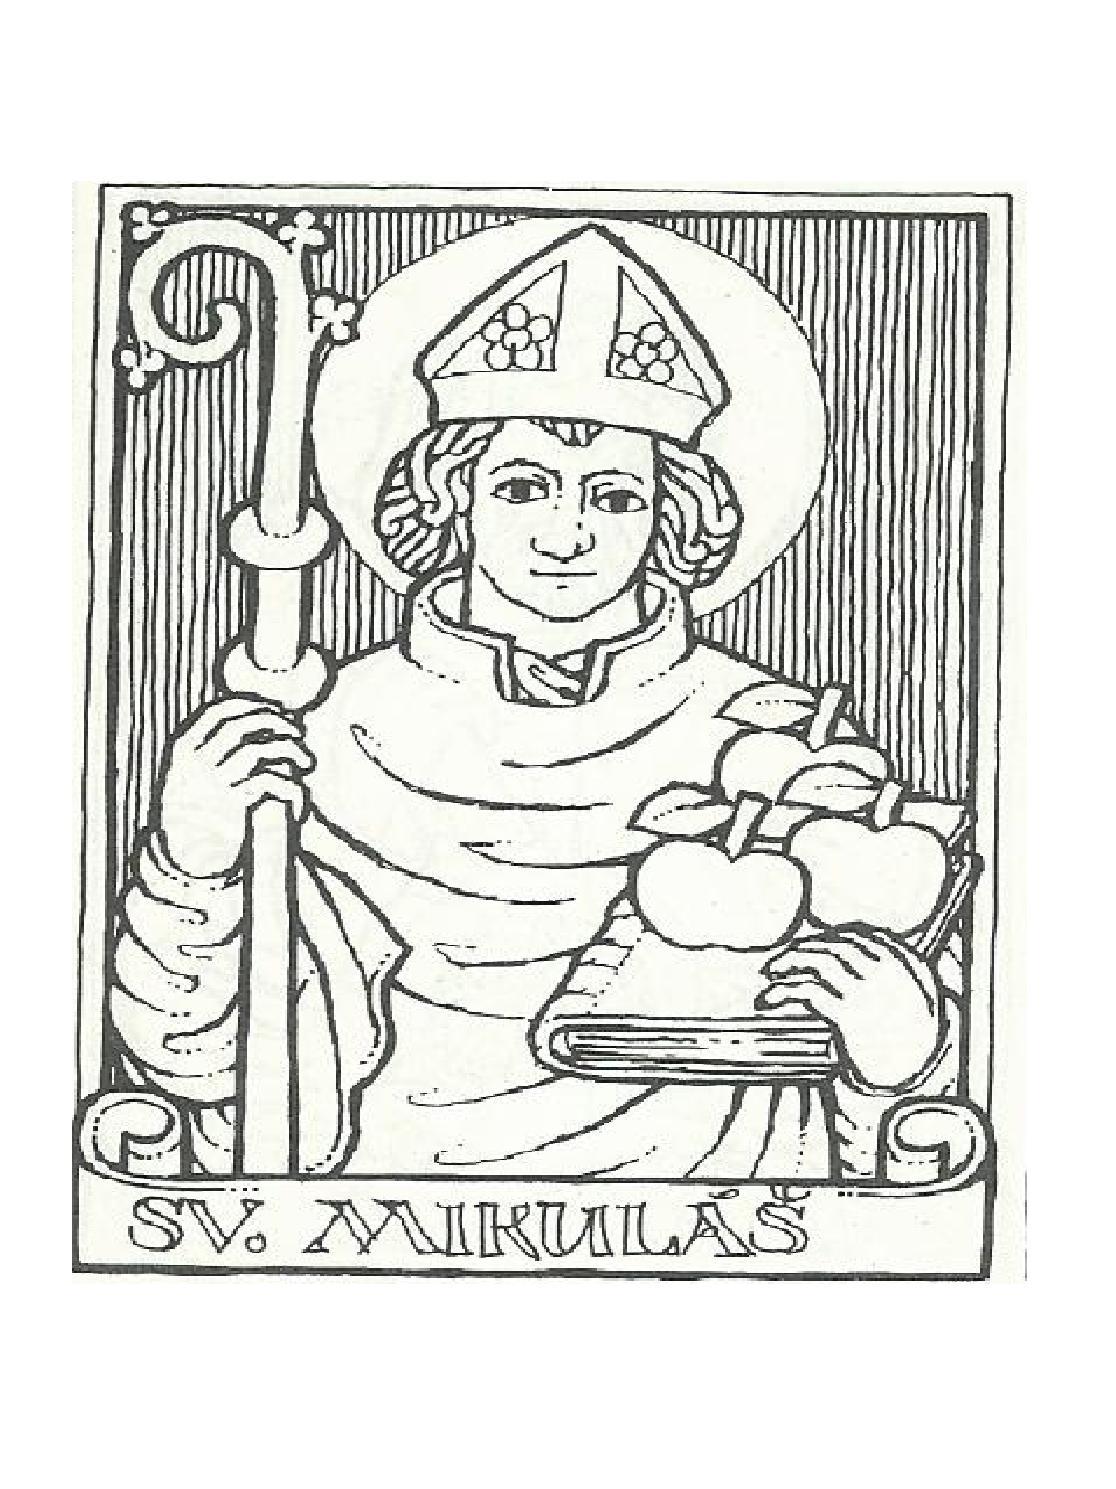 Svätý Mikuláš, zdroj: Ikonografie a atributy svatých (Praha 1991)